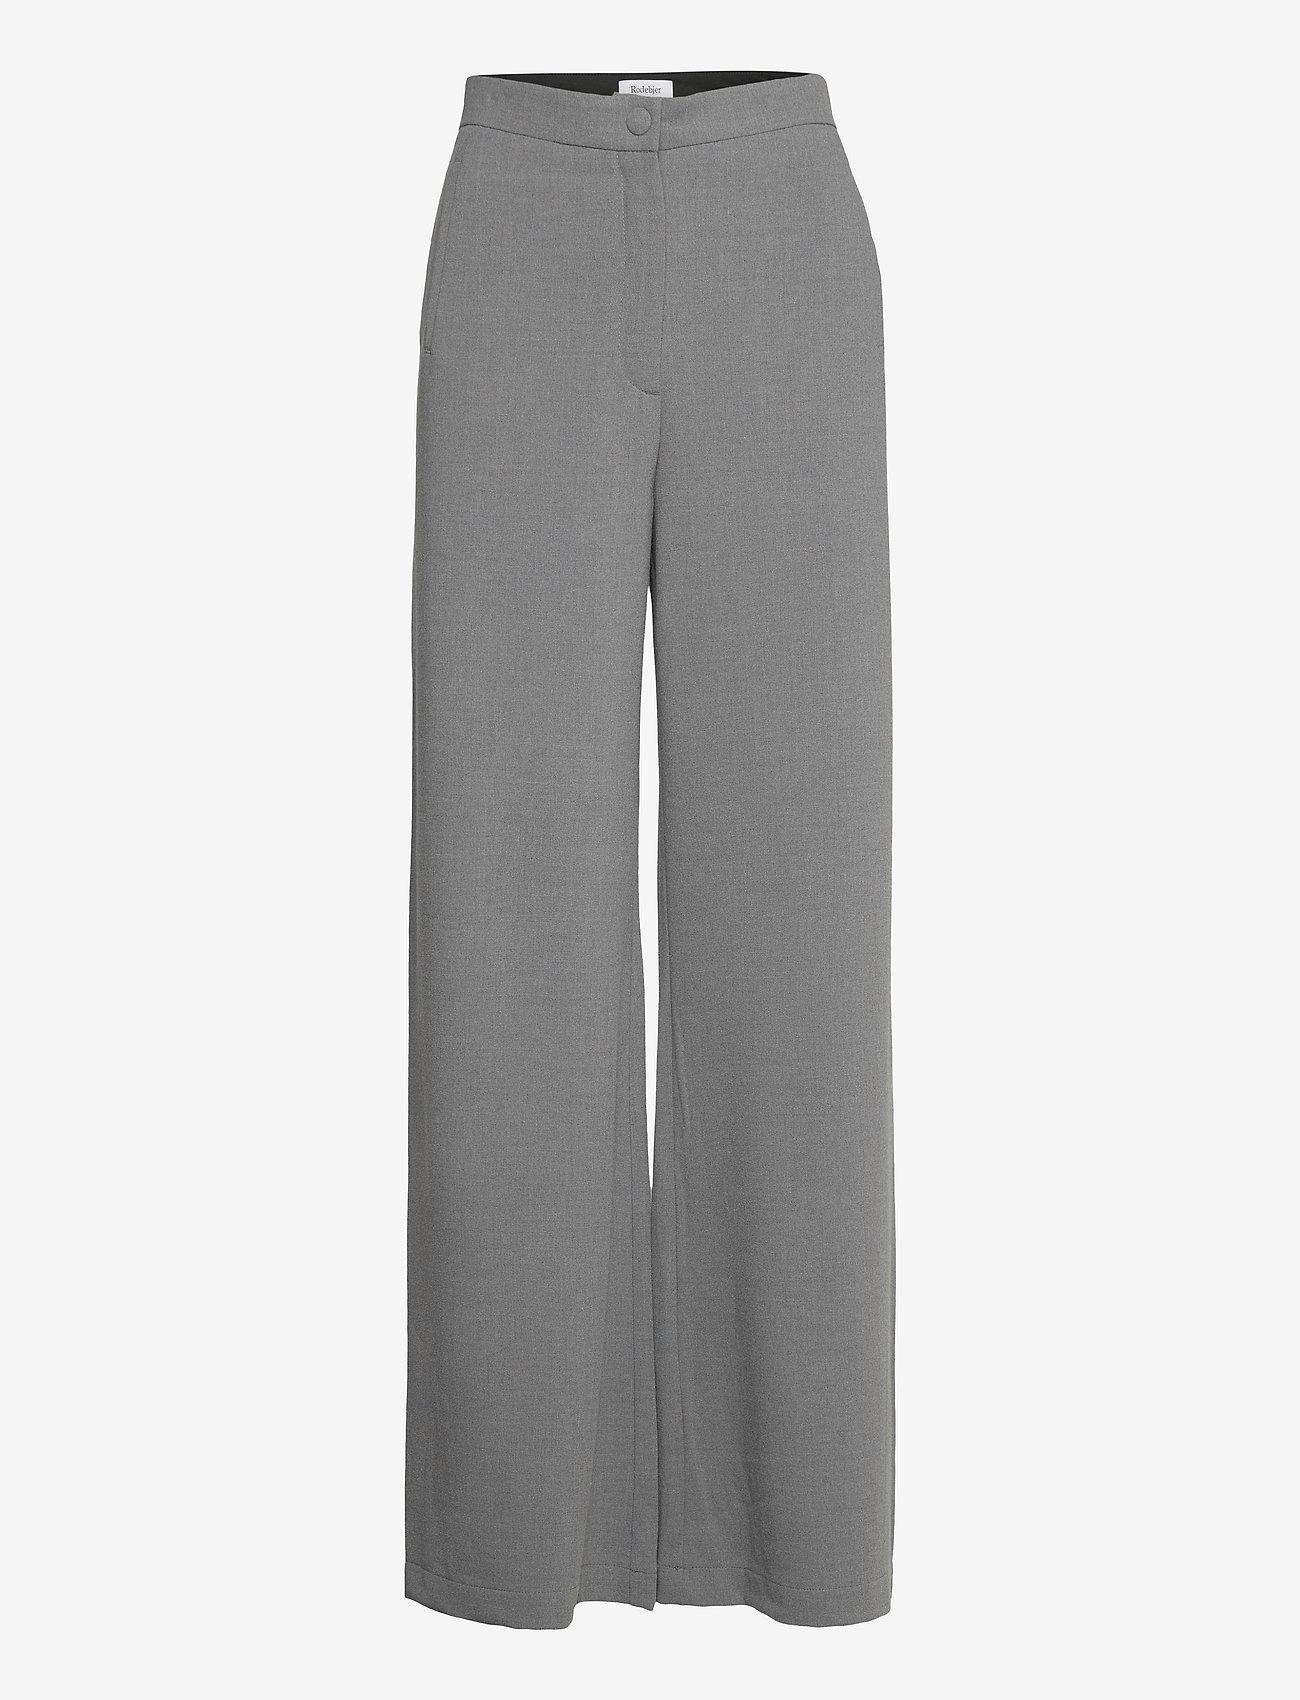 RODEBJER - SINI - bukser med brede ben - grey - 0